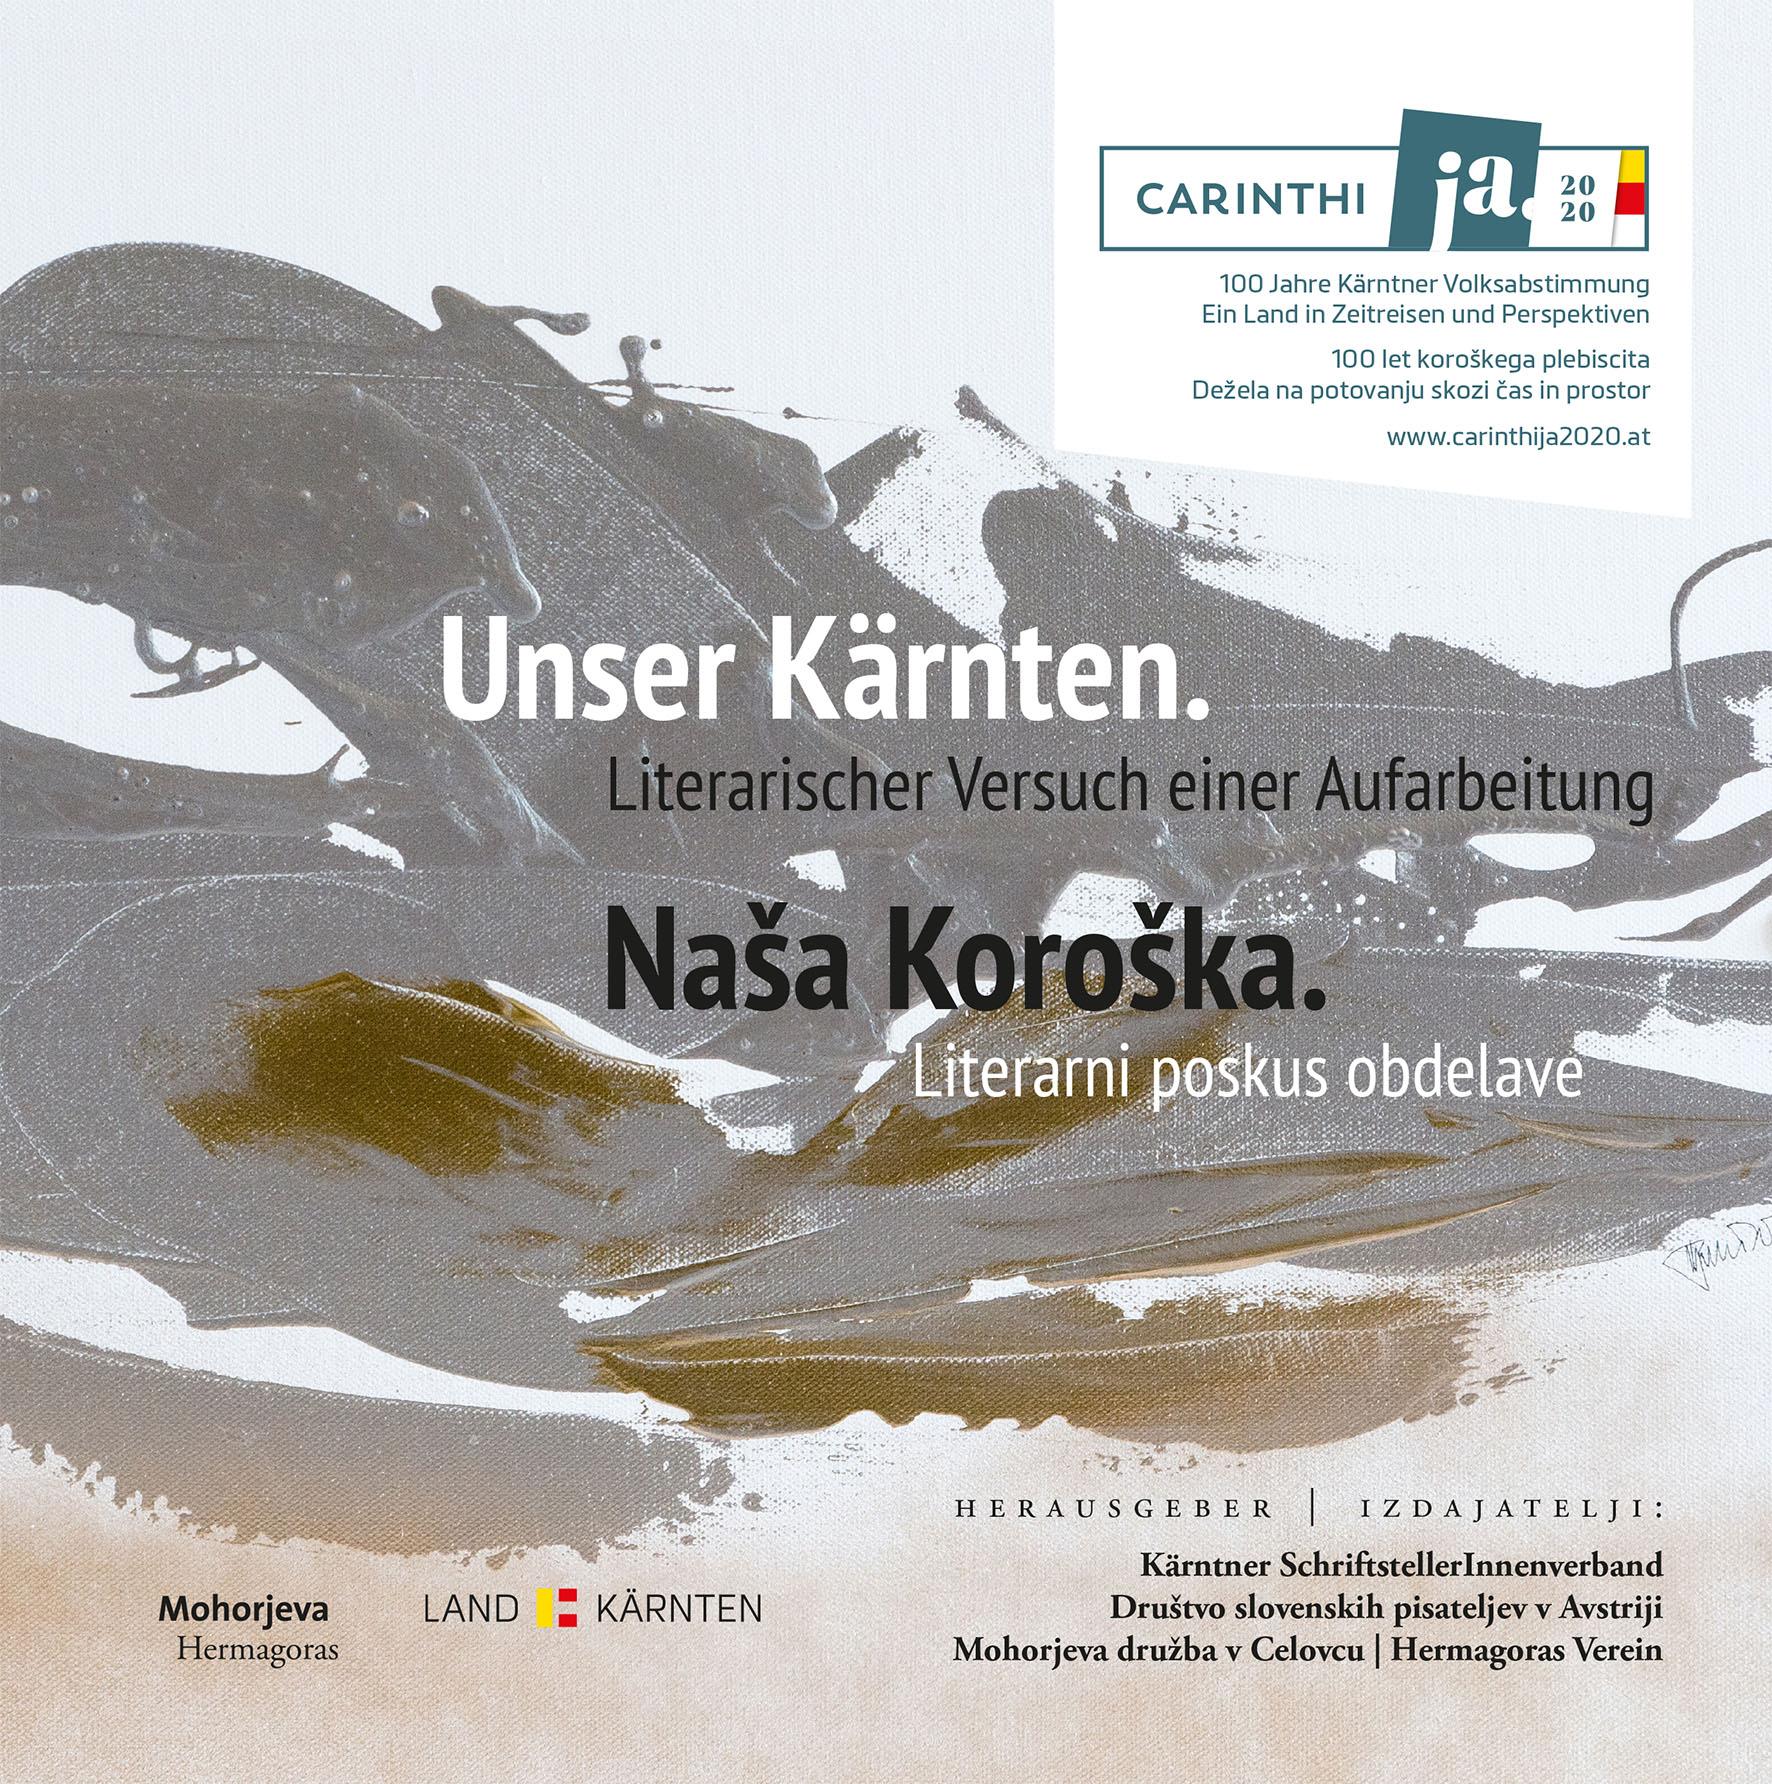 Bild: Buchpräsentation: Unser Kärnten - Naša Koroška